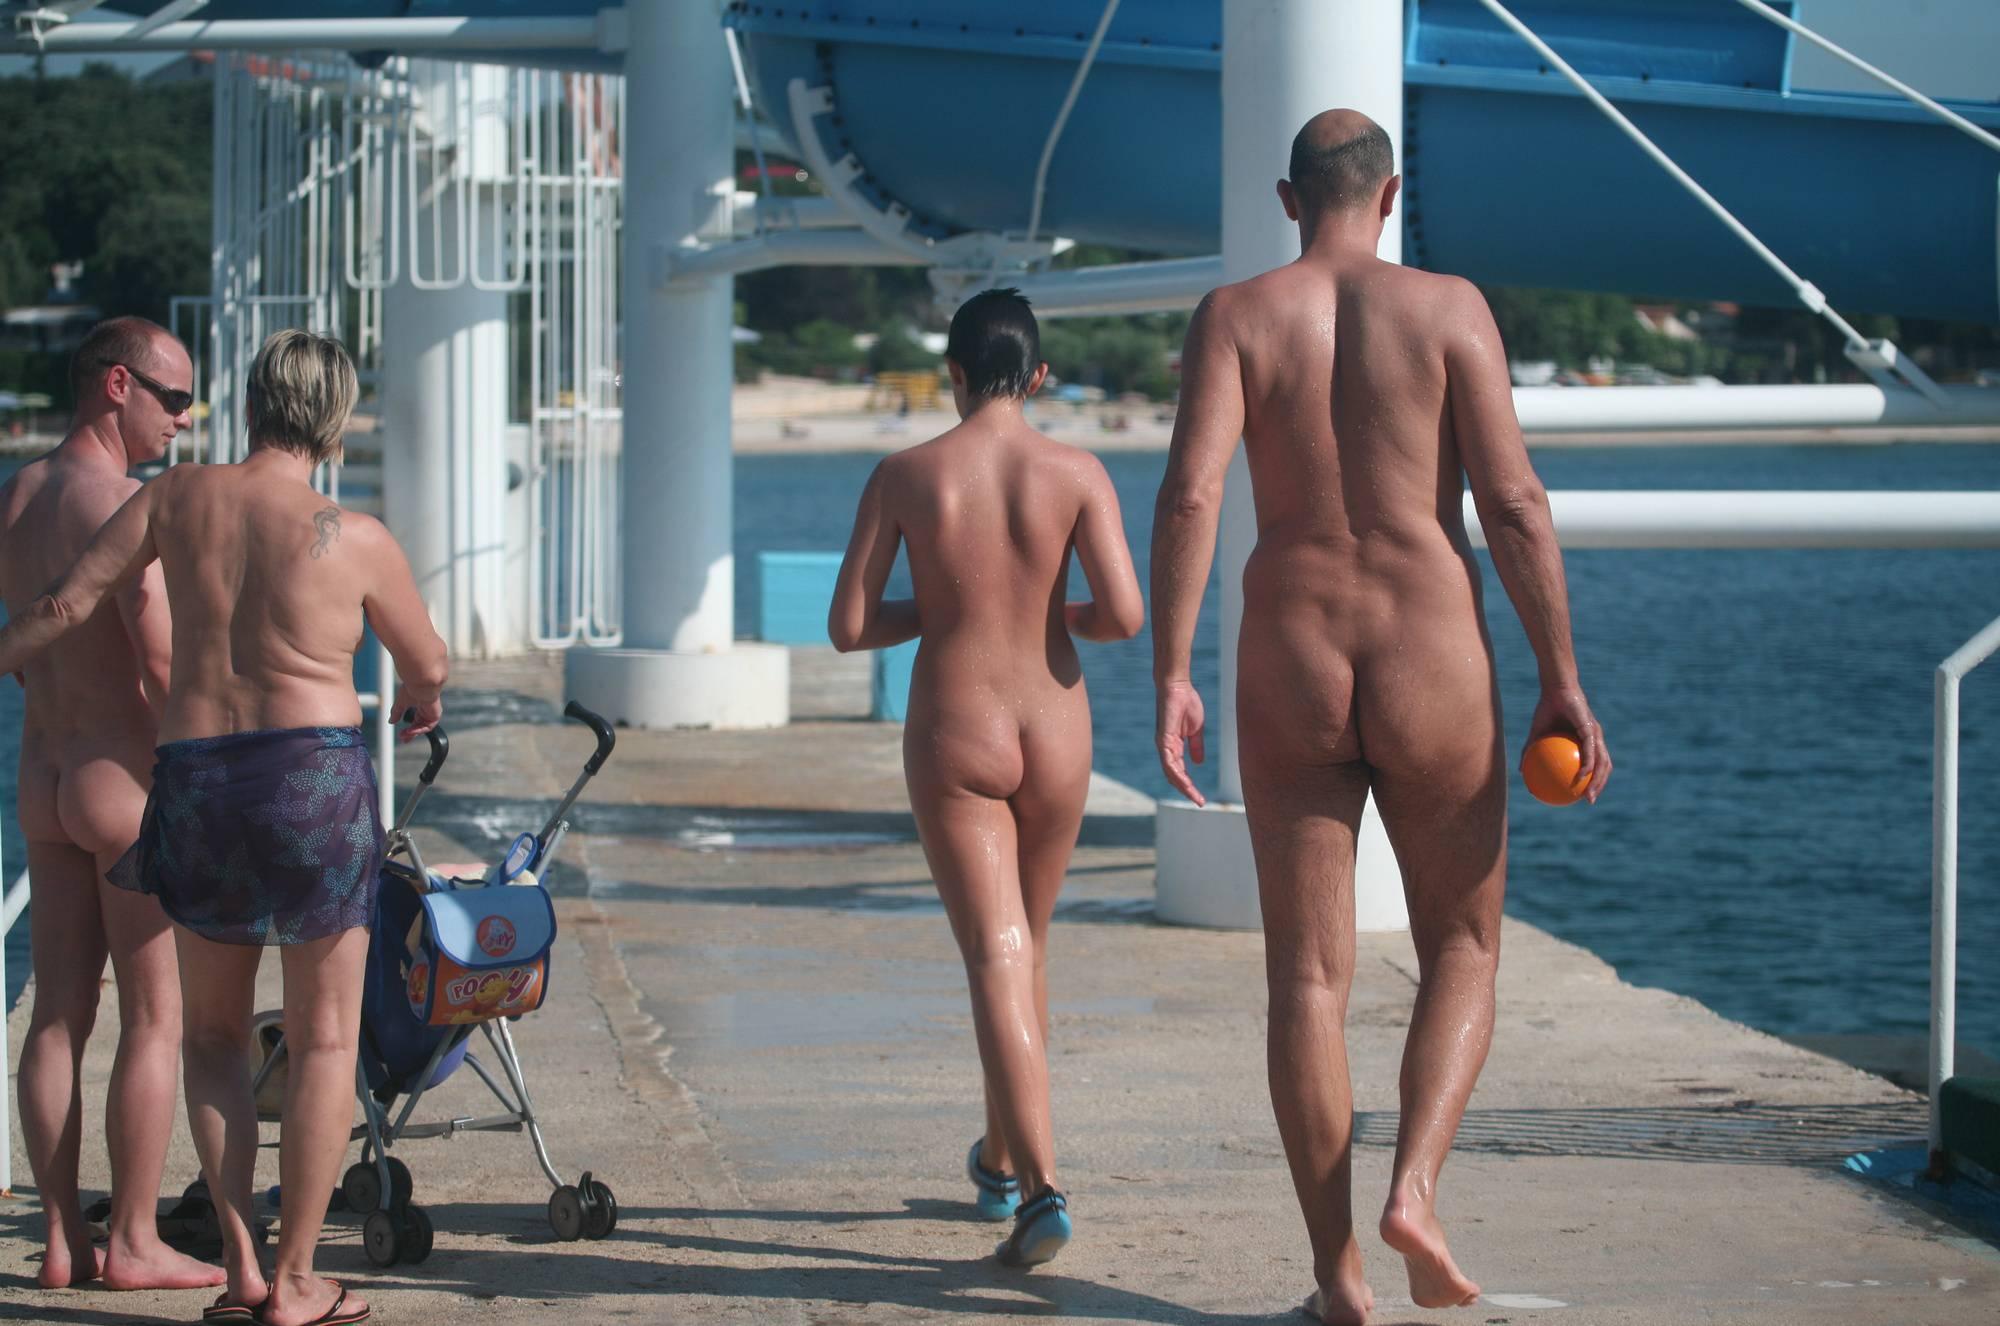 Nudist Pics Water Park Center Pass - 2